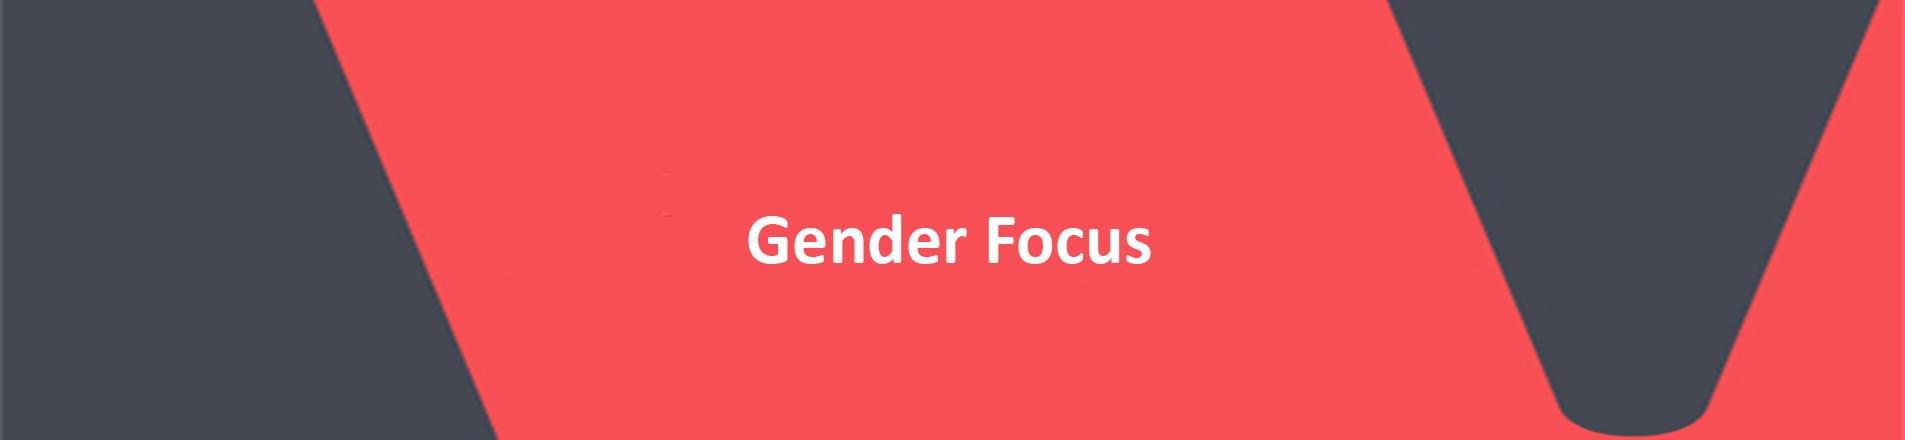 The words Gender Focus written on red VERCIDA branded background